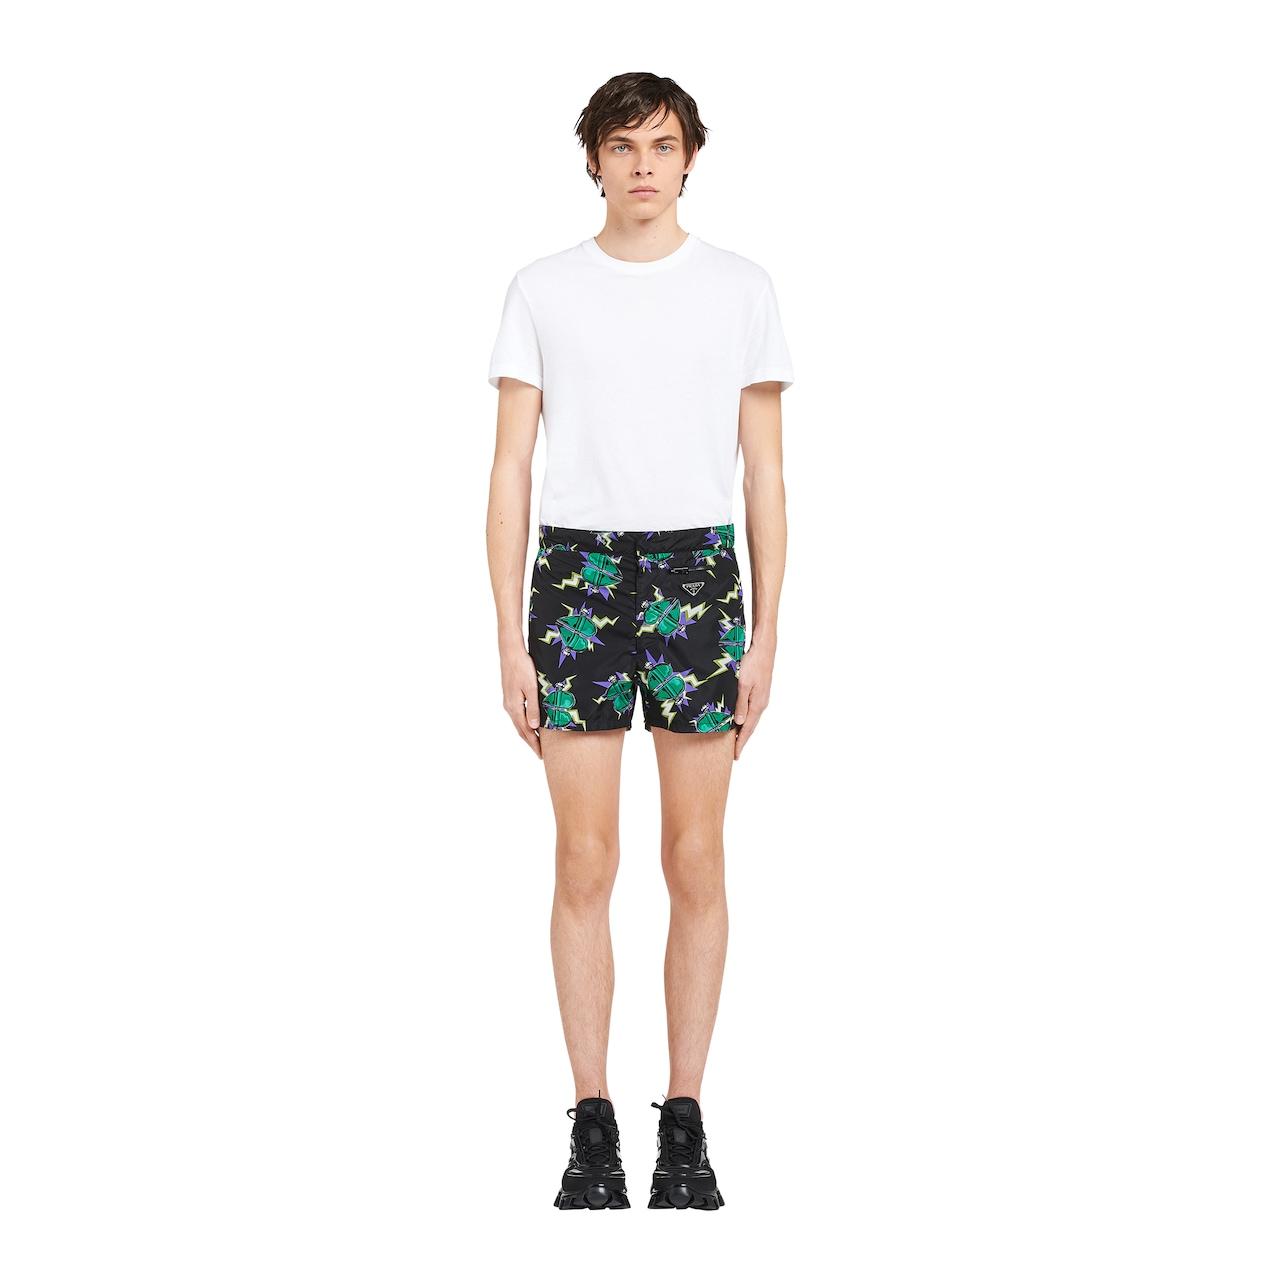 Nylon swim trunks